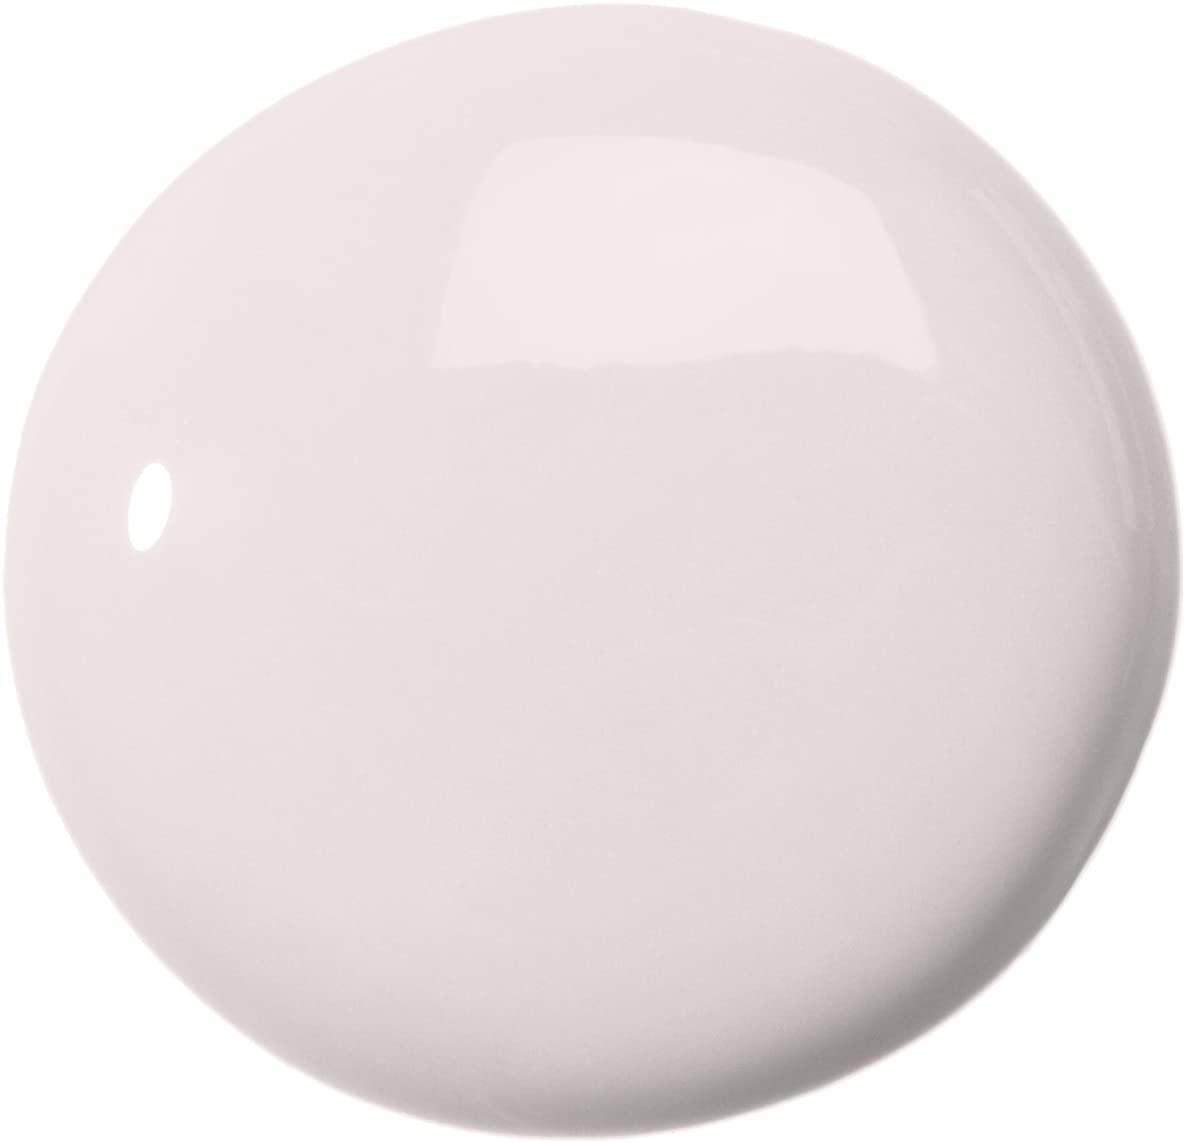 ELIXIR(エリクシール)ホワイト スリーピングクリアパック Cの商品画像14